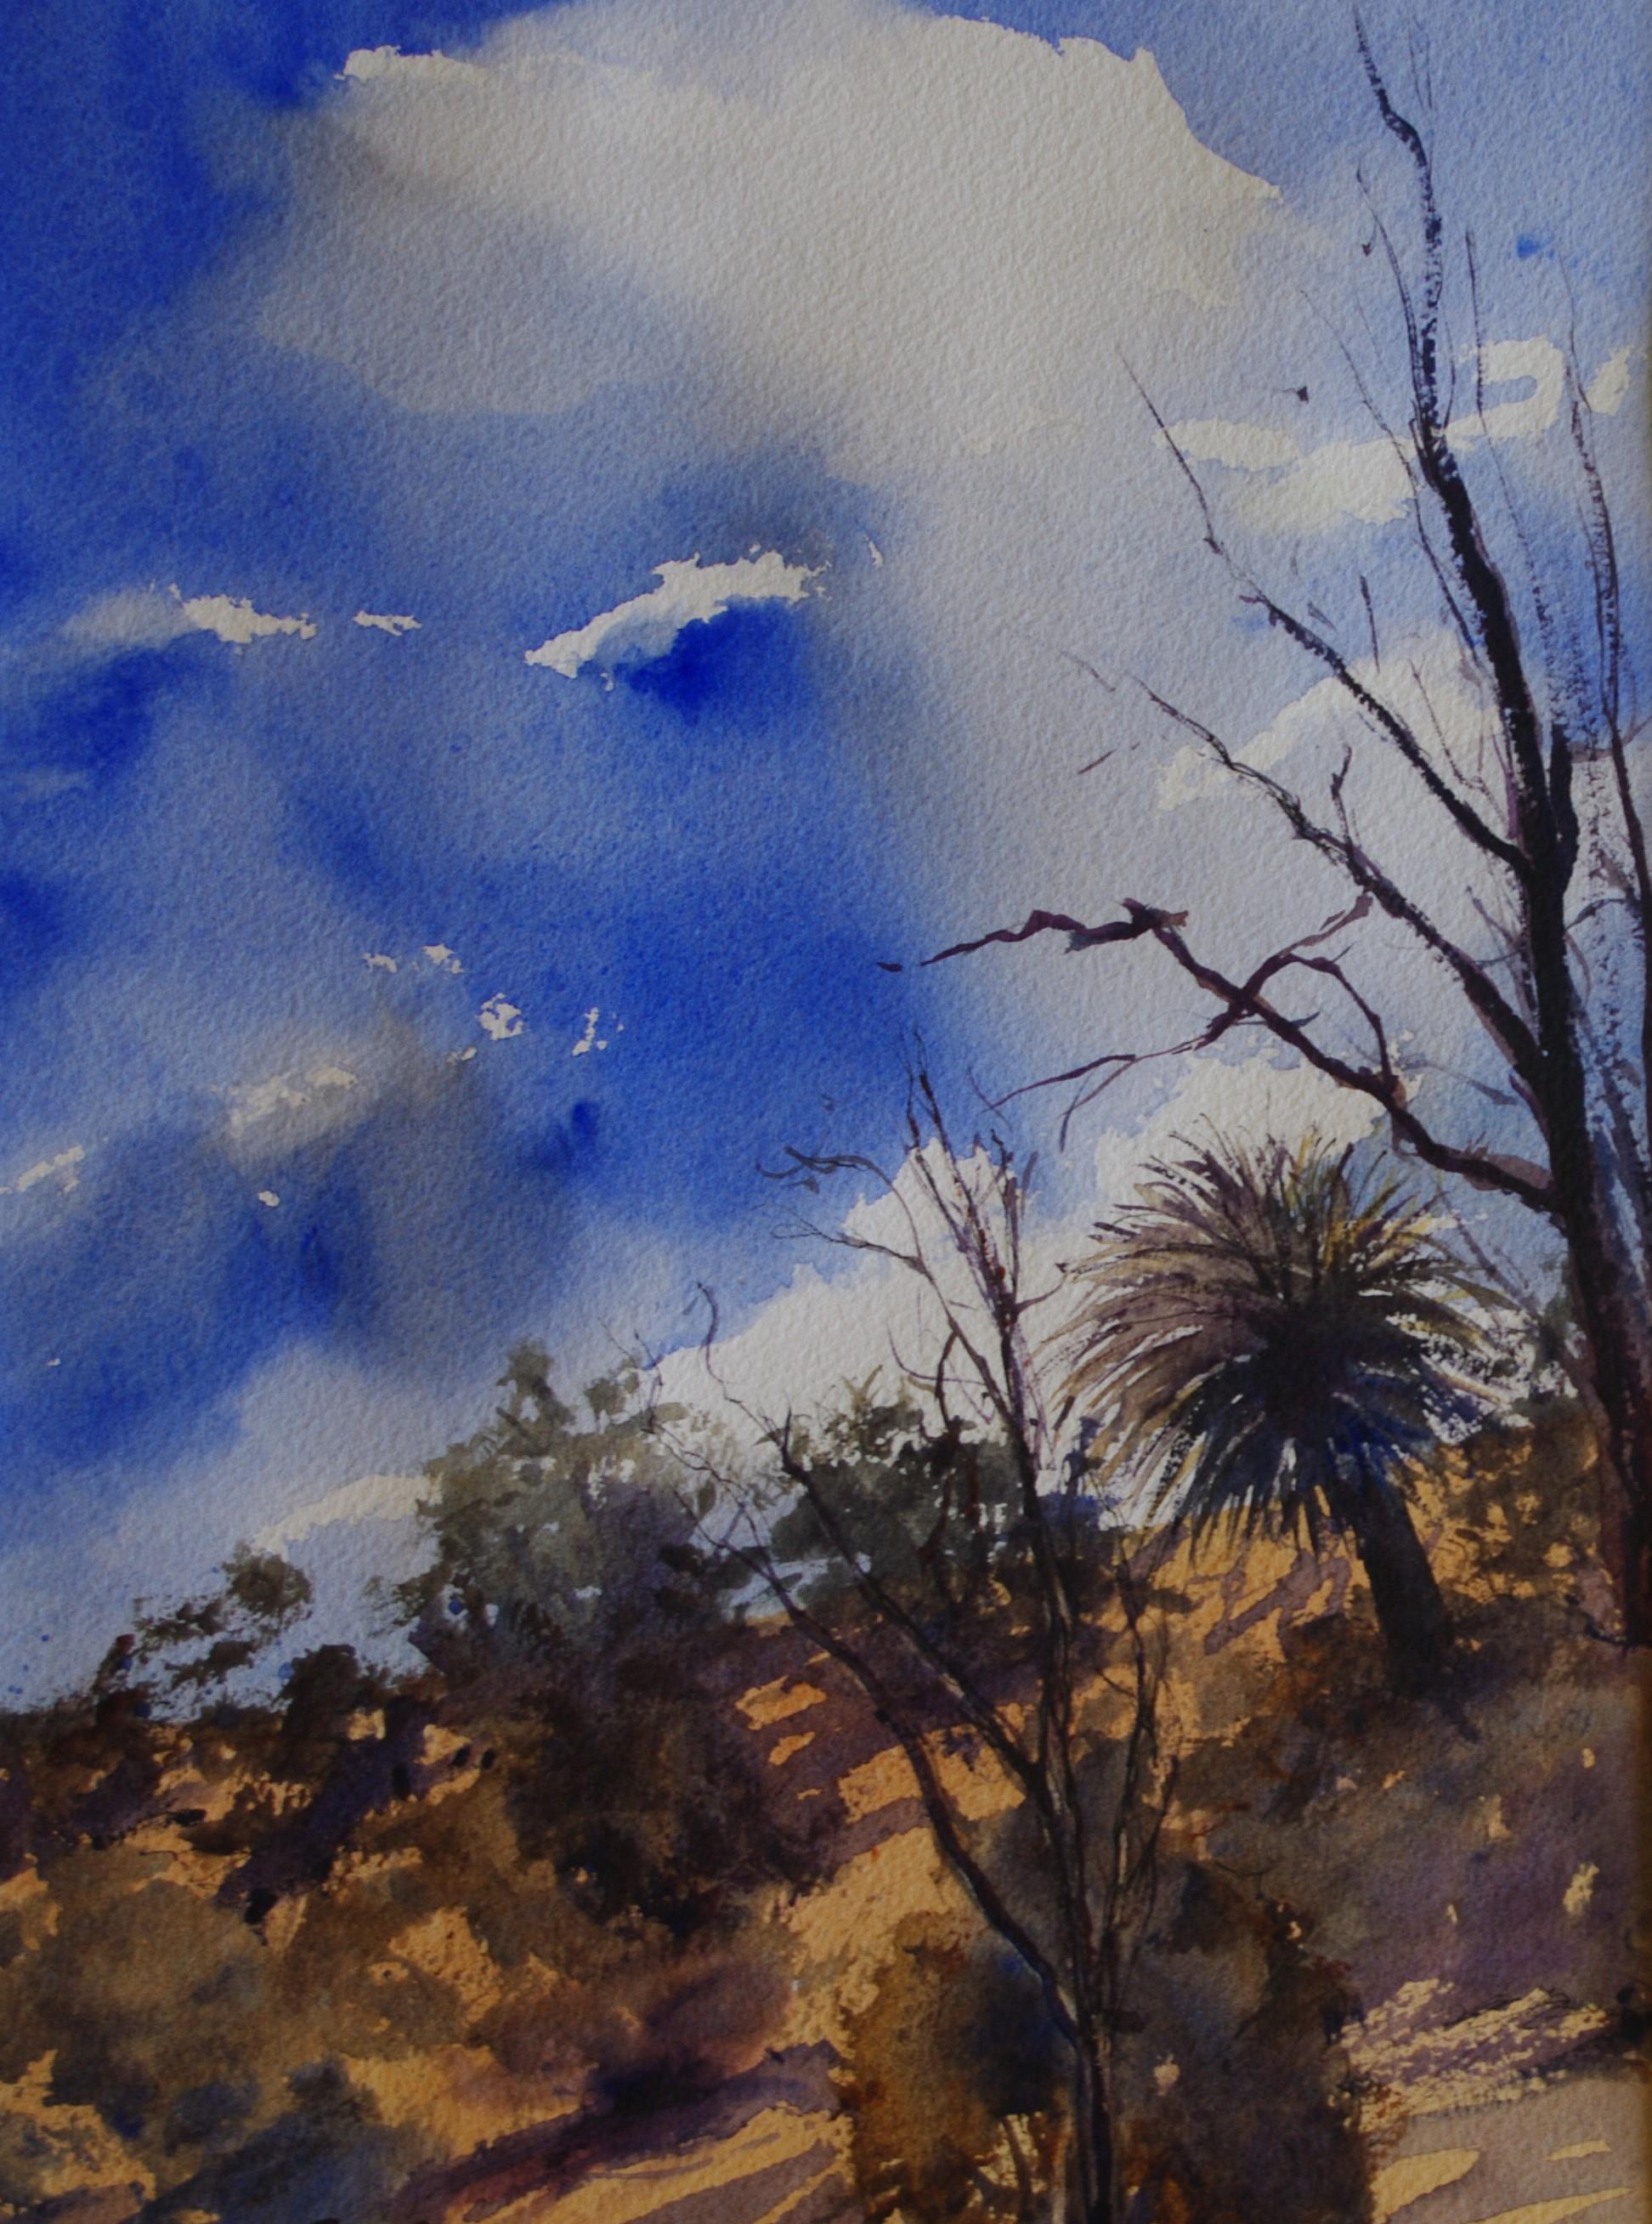 Australian Bush Scene  26cm x 36cm  Original Watercolour  Unframed   $150